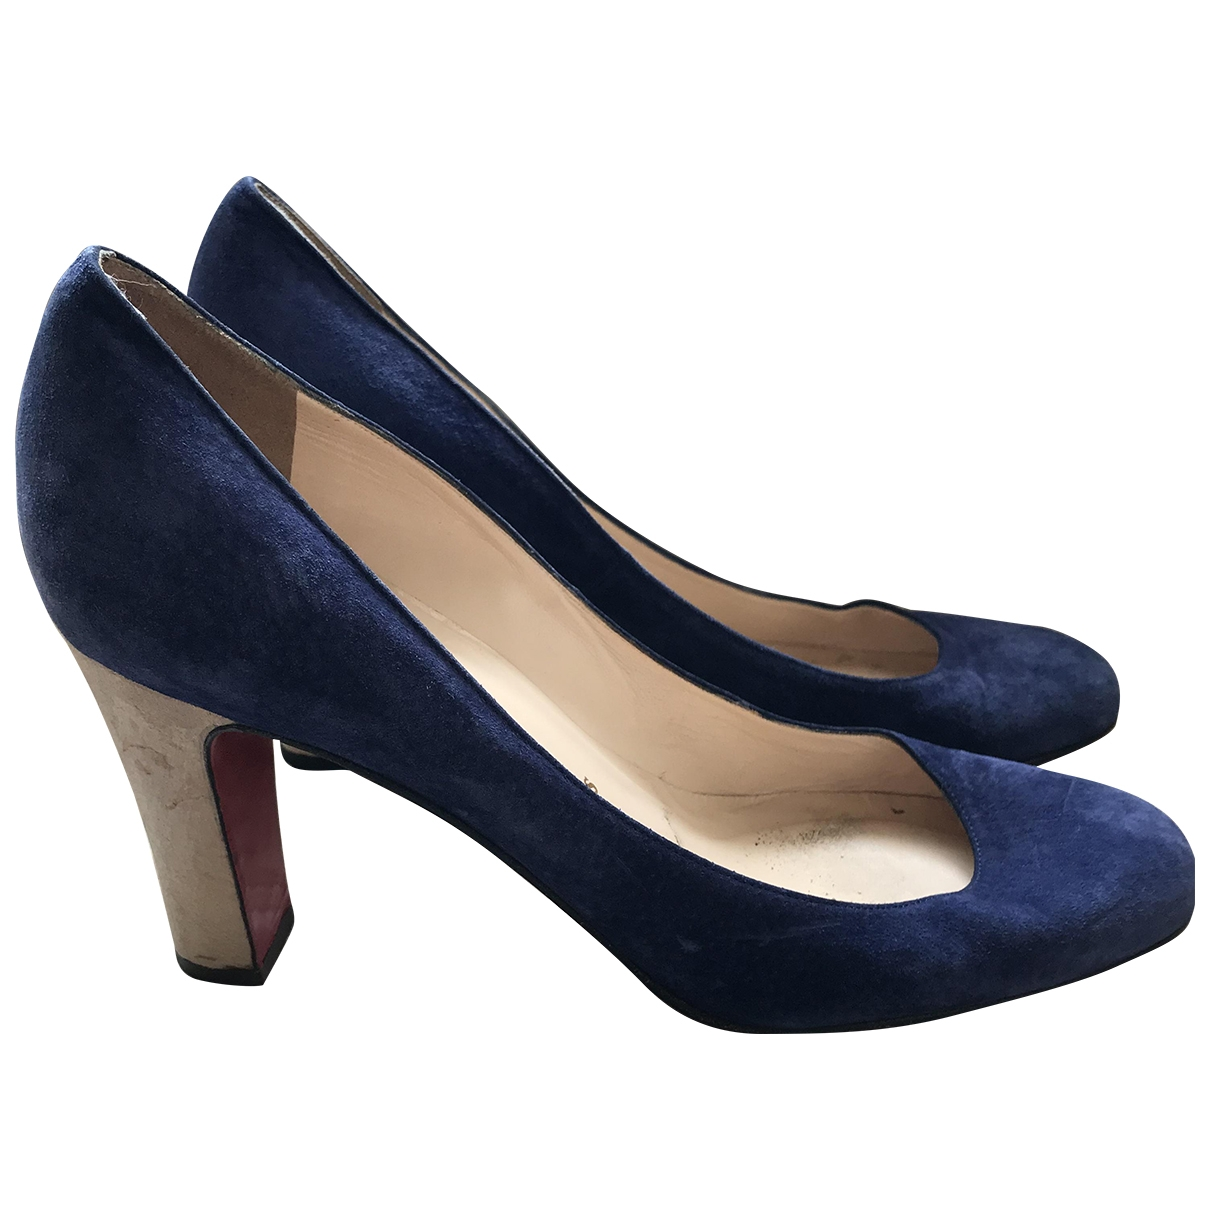 Christian Louboutin \N Blue Suede Heels for Women 5 UK